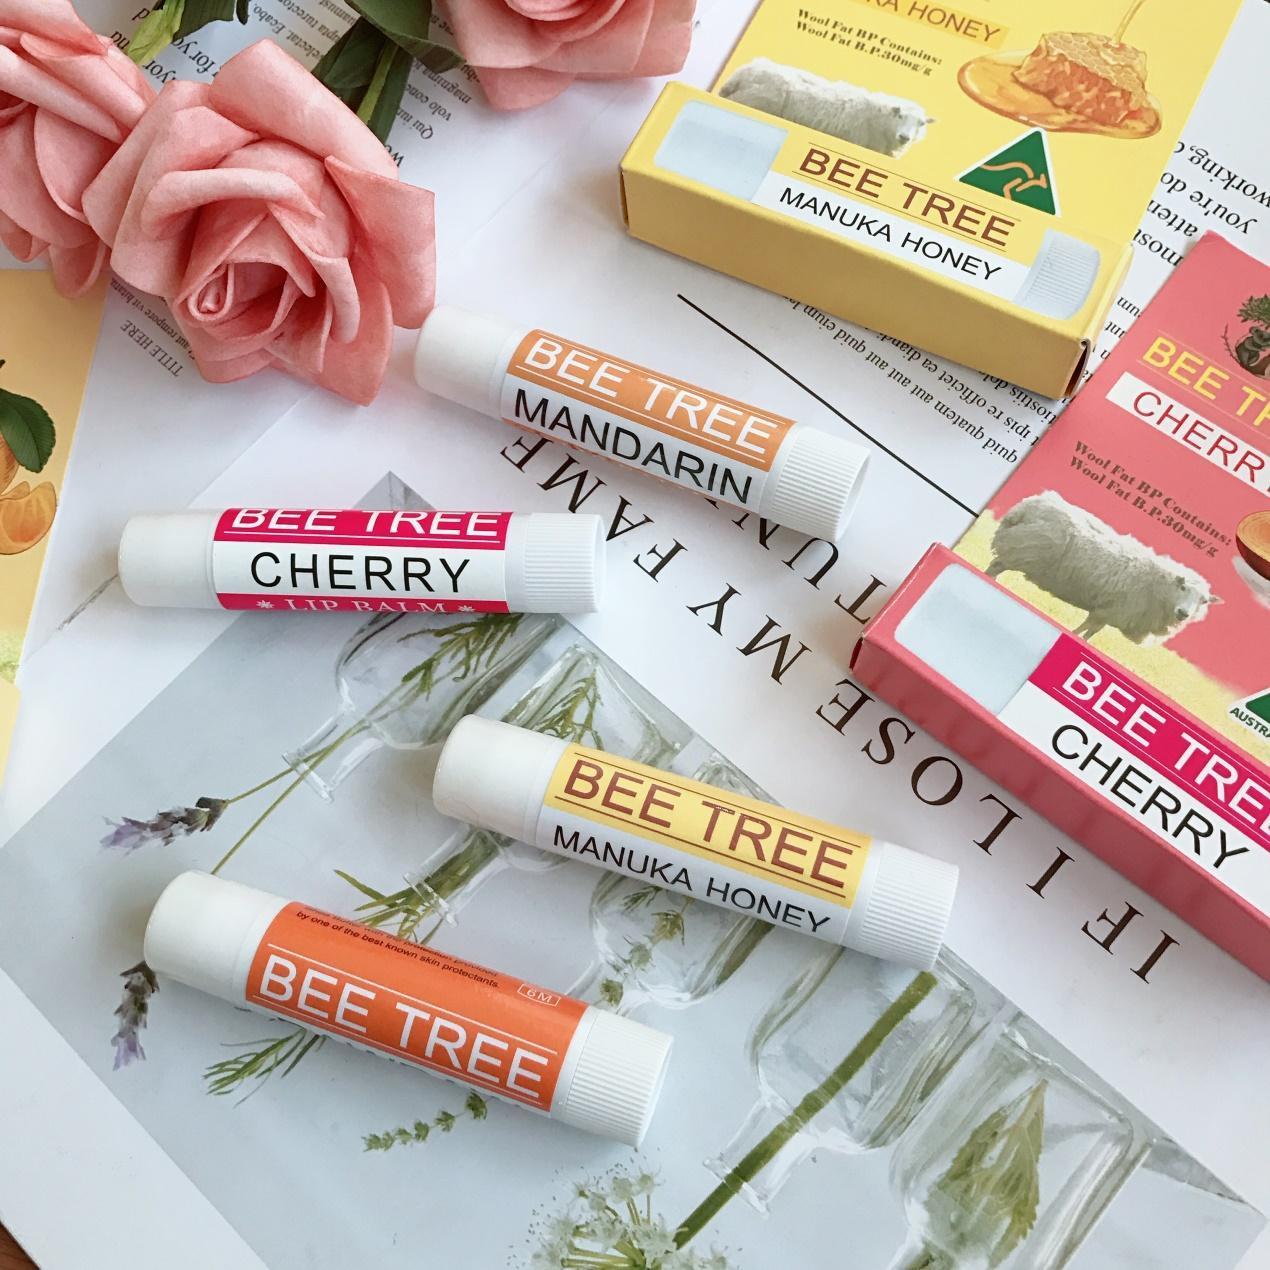 C:\Users\marketing05\Desktop\澳洲 BEE TREE~麥蘆卡蜂蜜/木瓜萬用/櫻桃小嘴香氛/甜橙Q彈 潤唇膏\IMG_7745.JPG